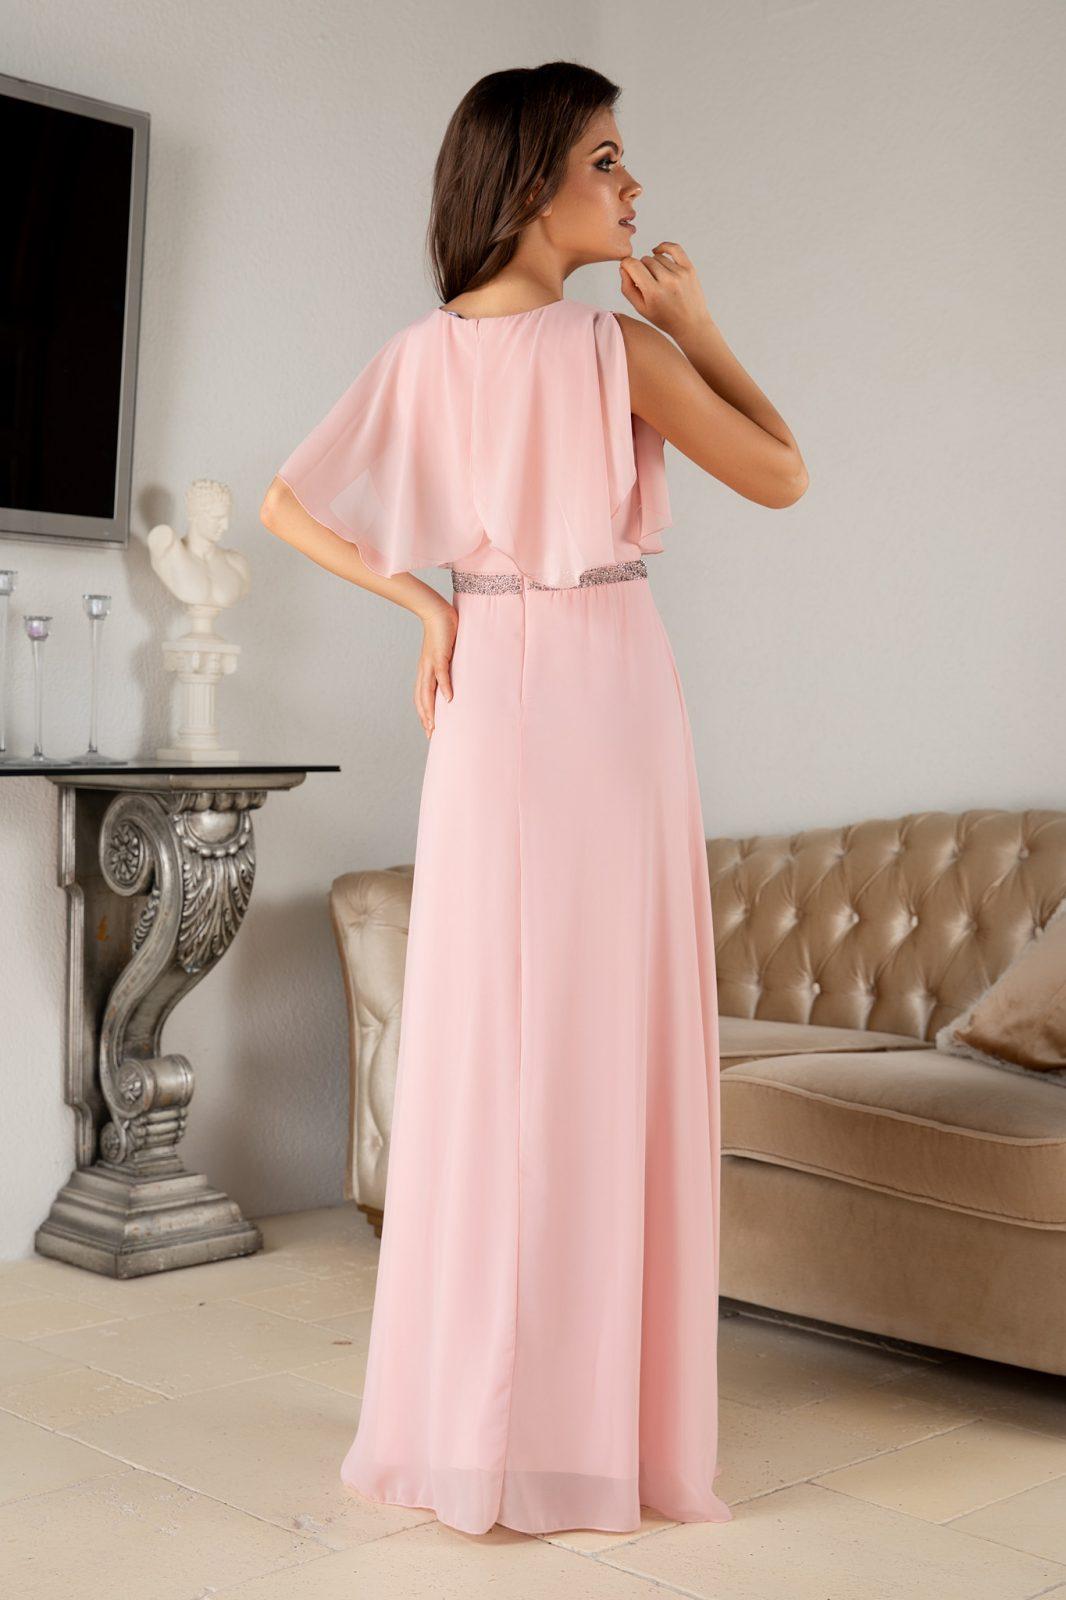 Giovanna Ροδακινί  Φόρεμα 4920